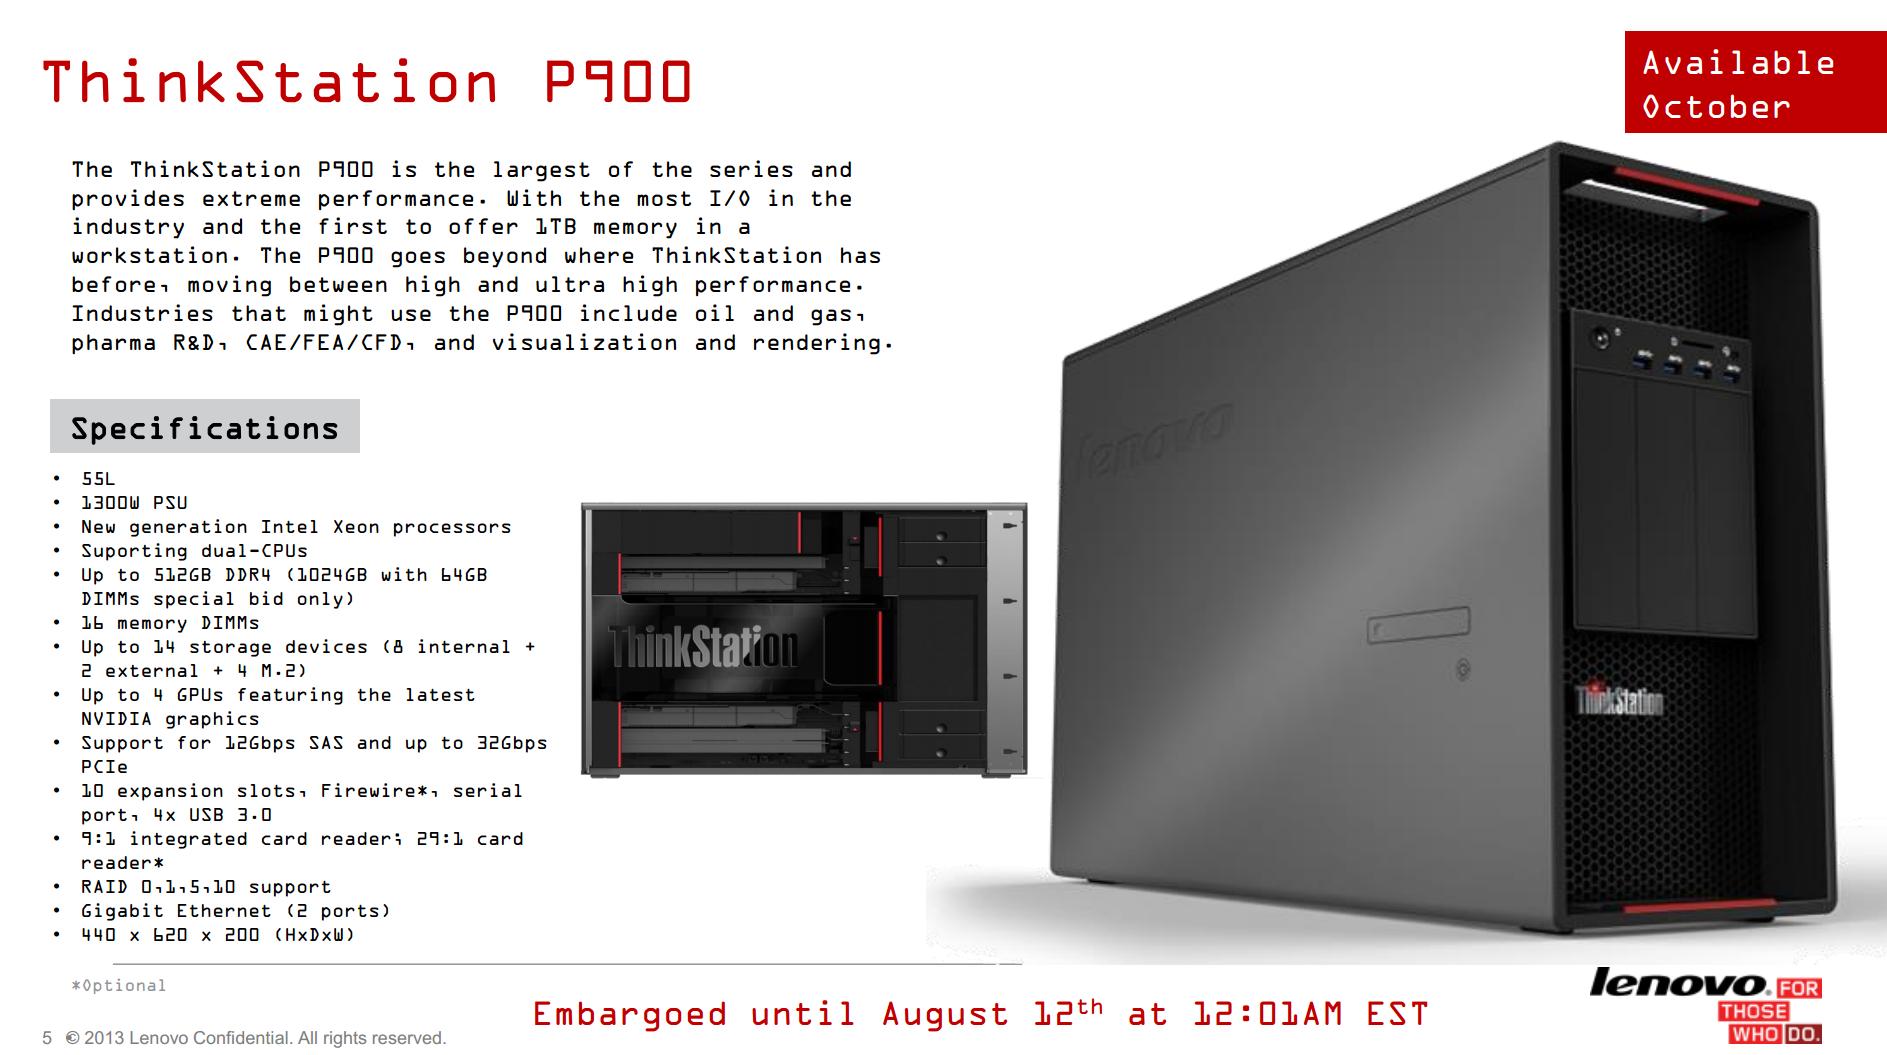 Lenovo ThinkStation P900 Realtek Card Reader 64 BIT